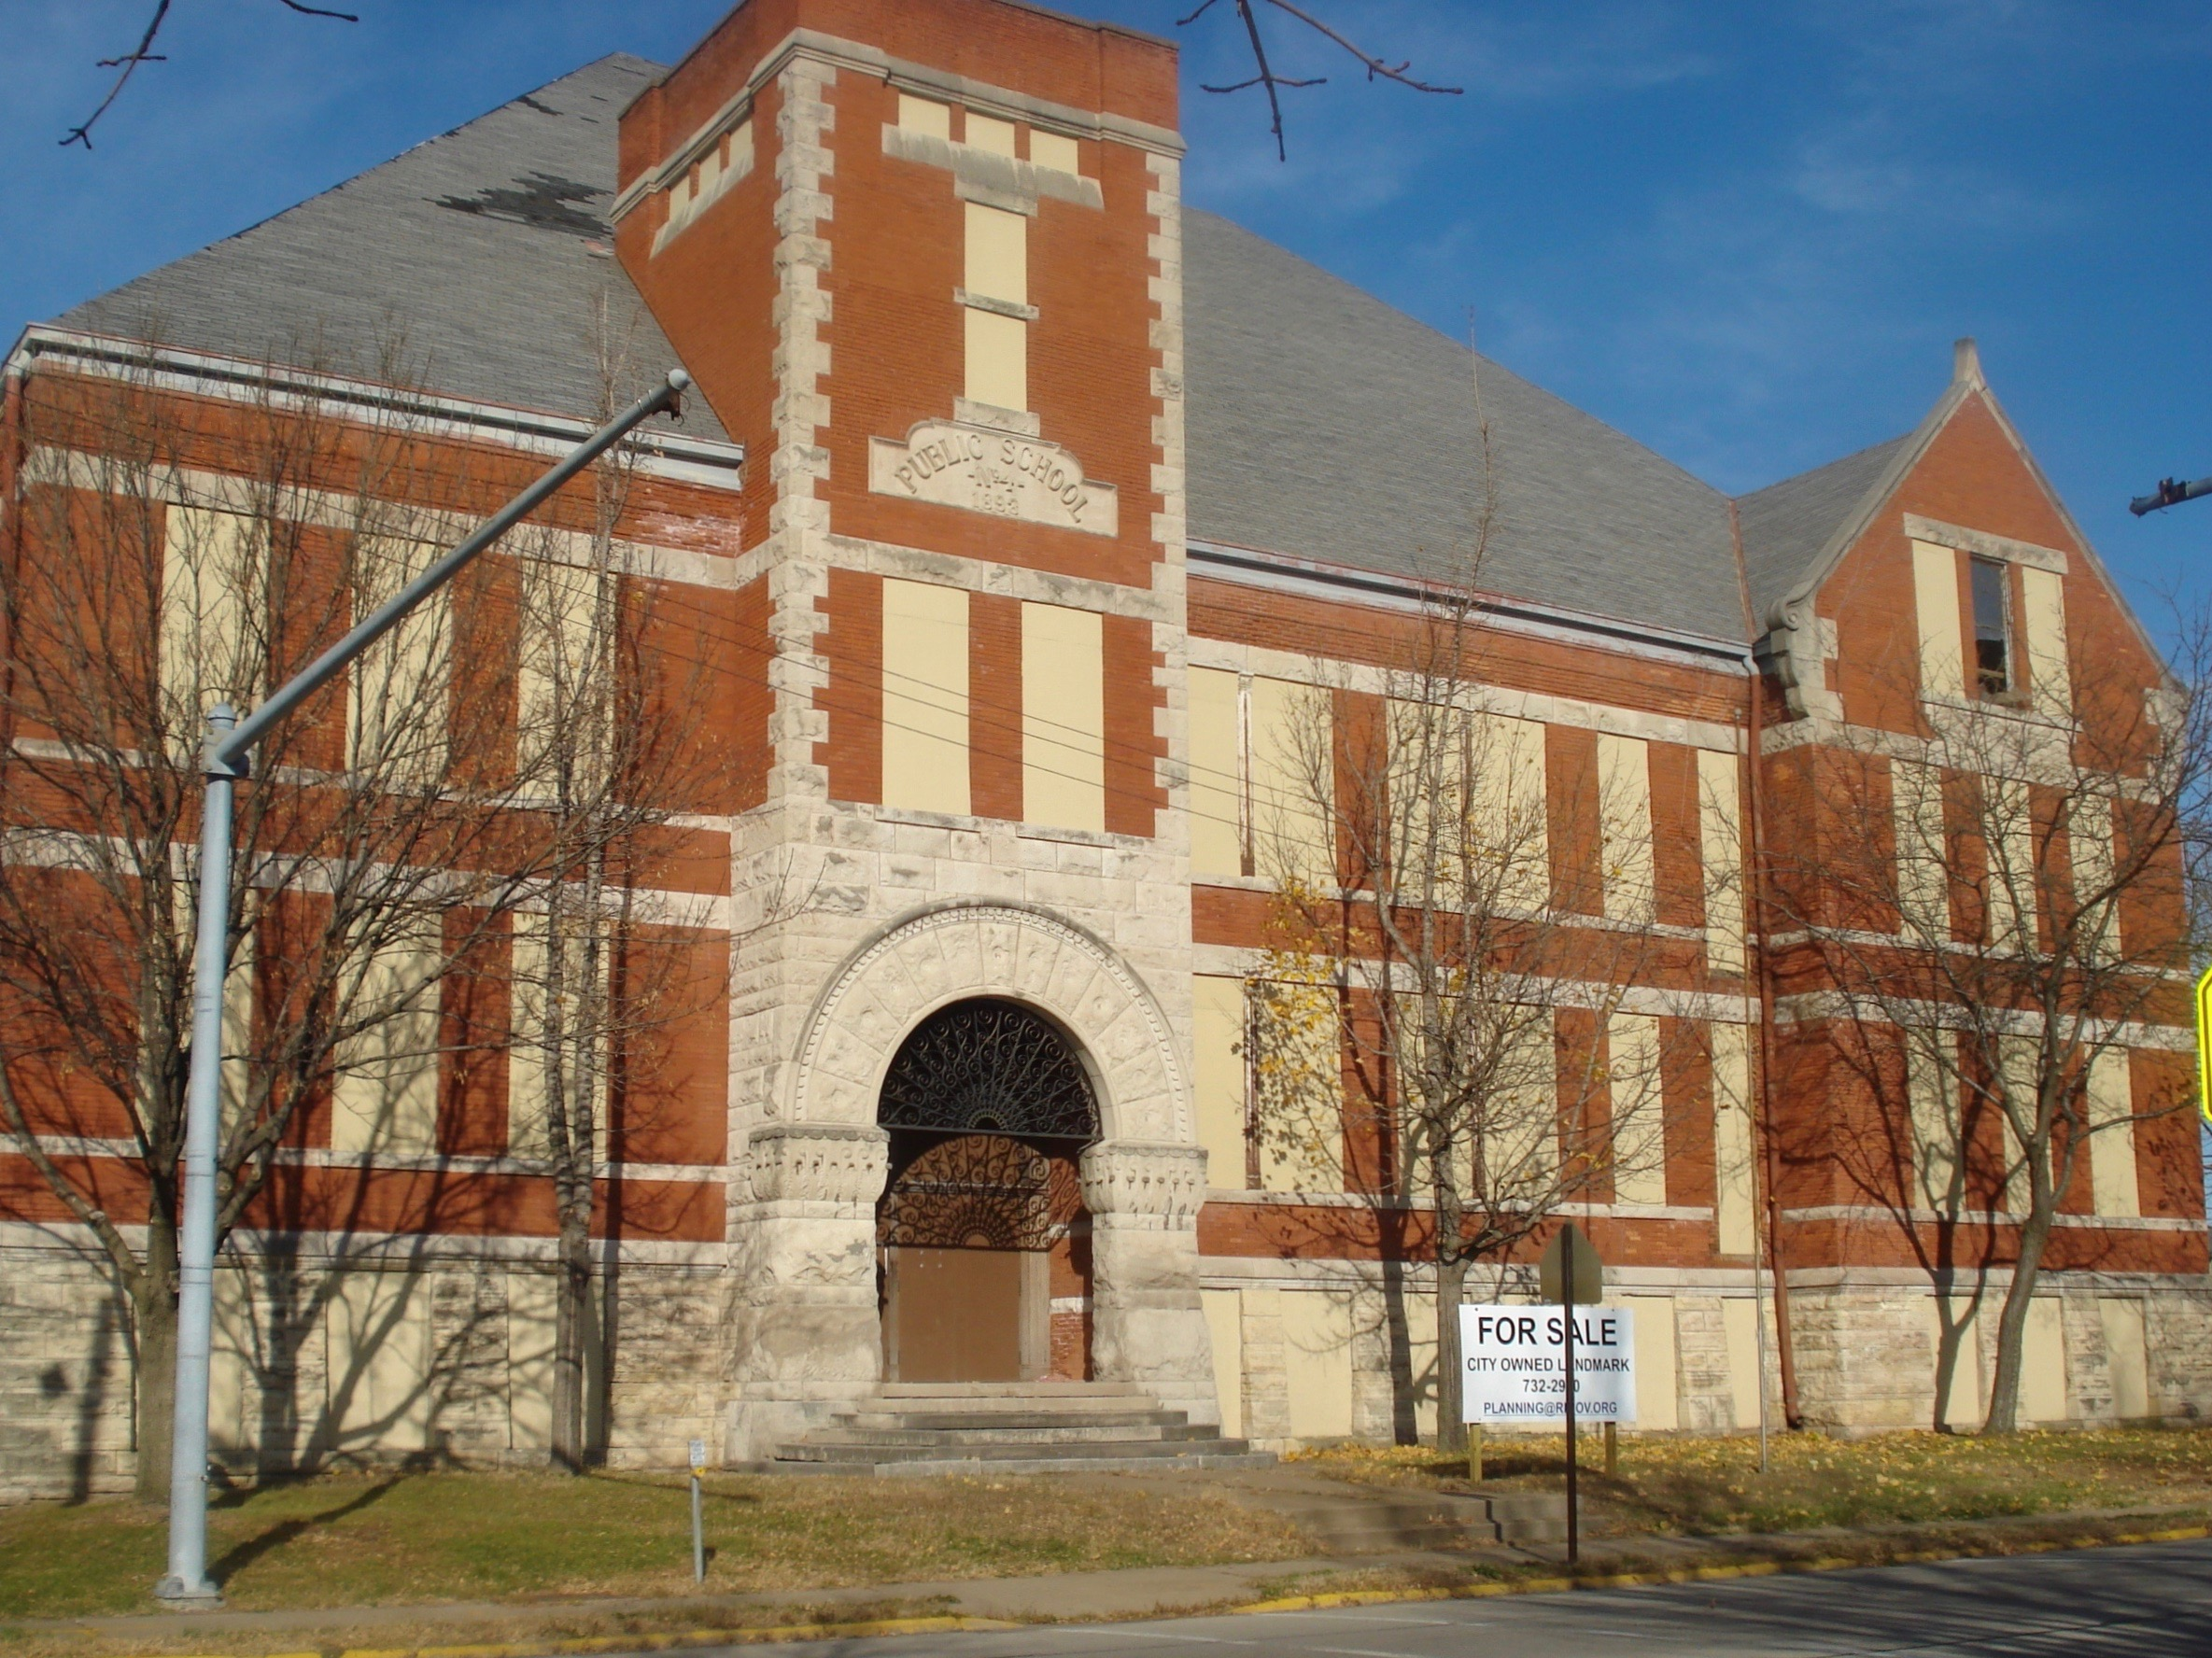 Lincoln School in Rock Island was torn down in 2012. (Wikimedia Commons/Kepper66)